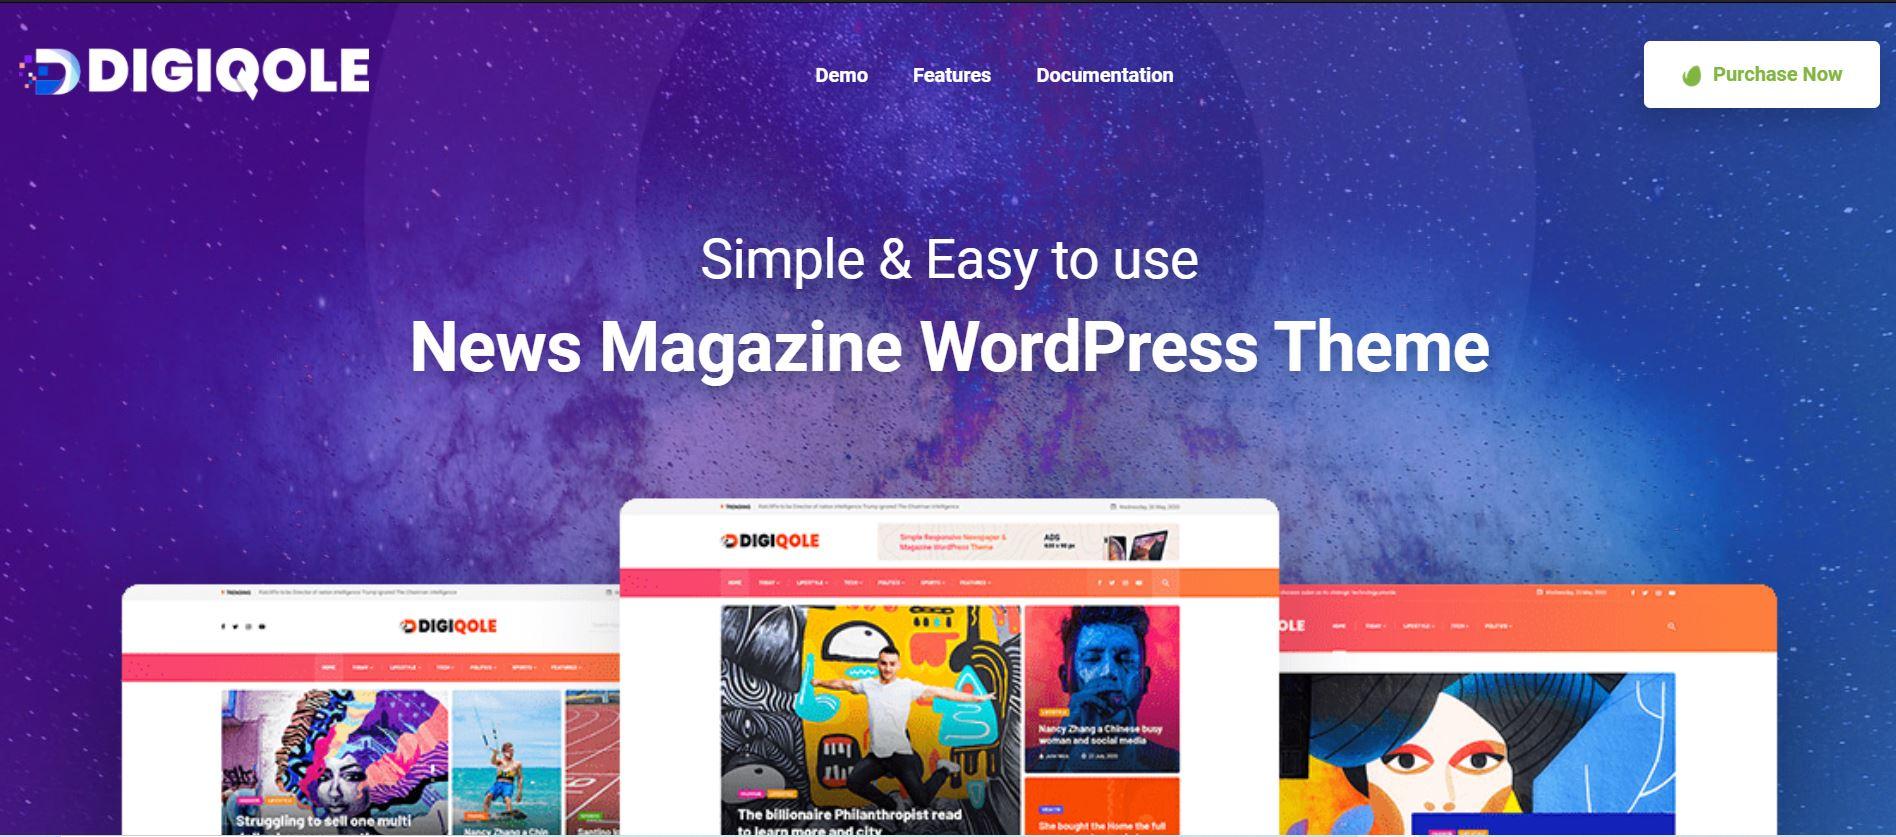 Digiqole The News And The Magazine WordPress Theme